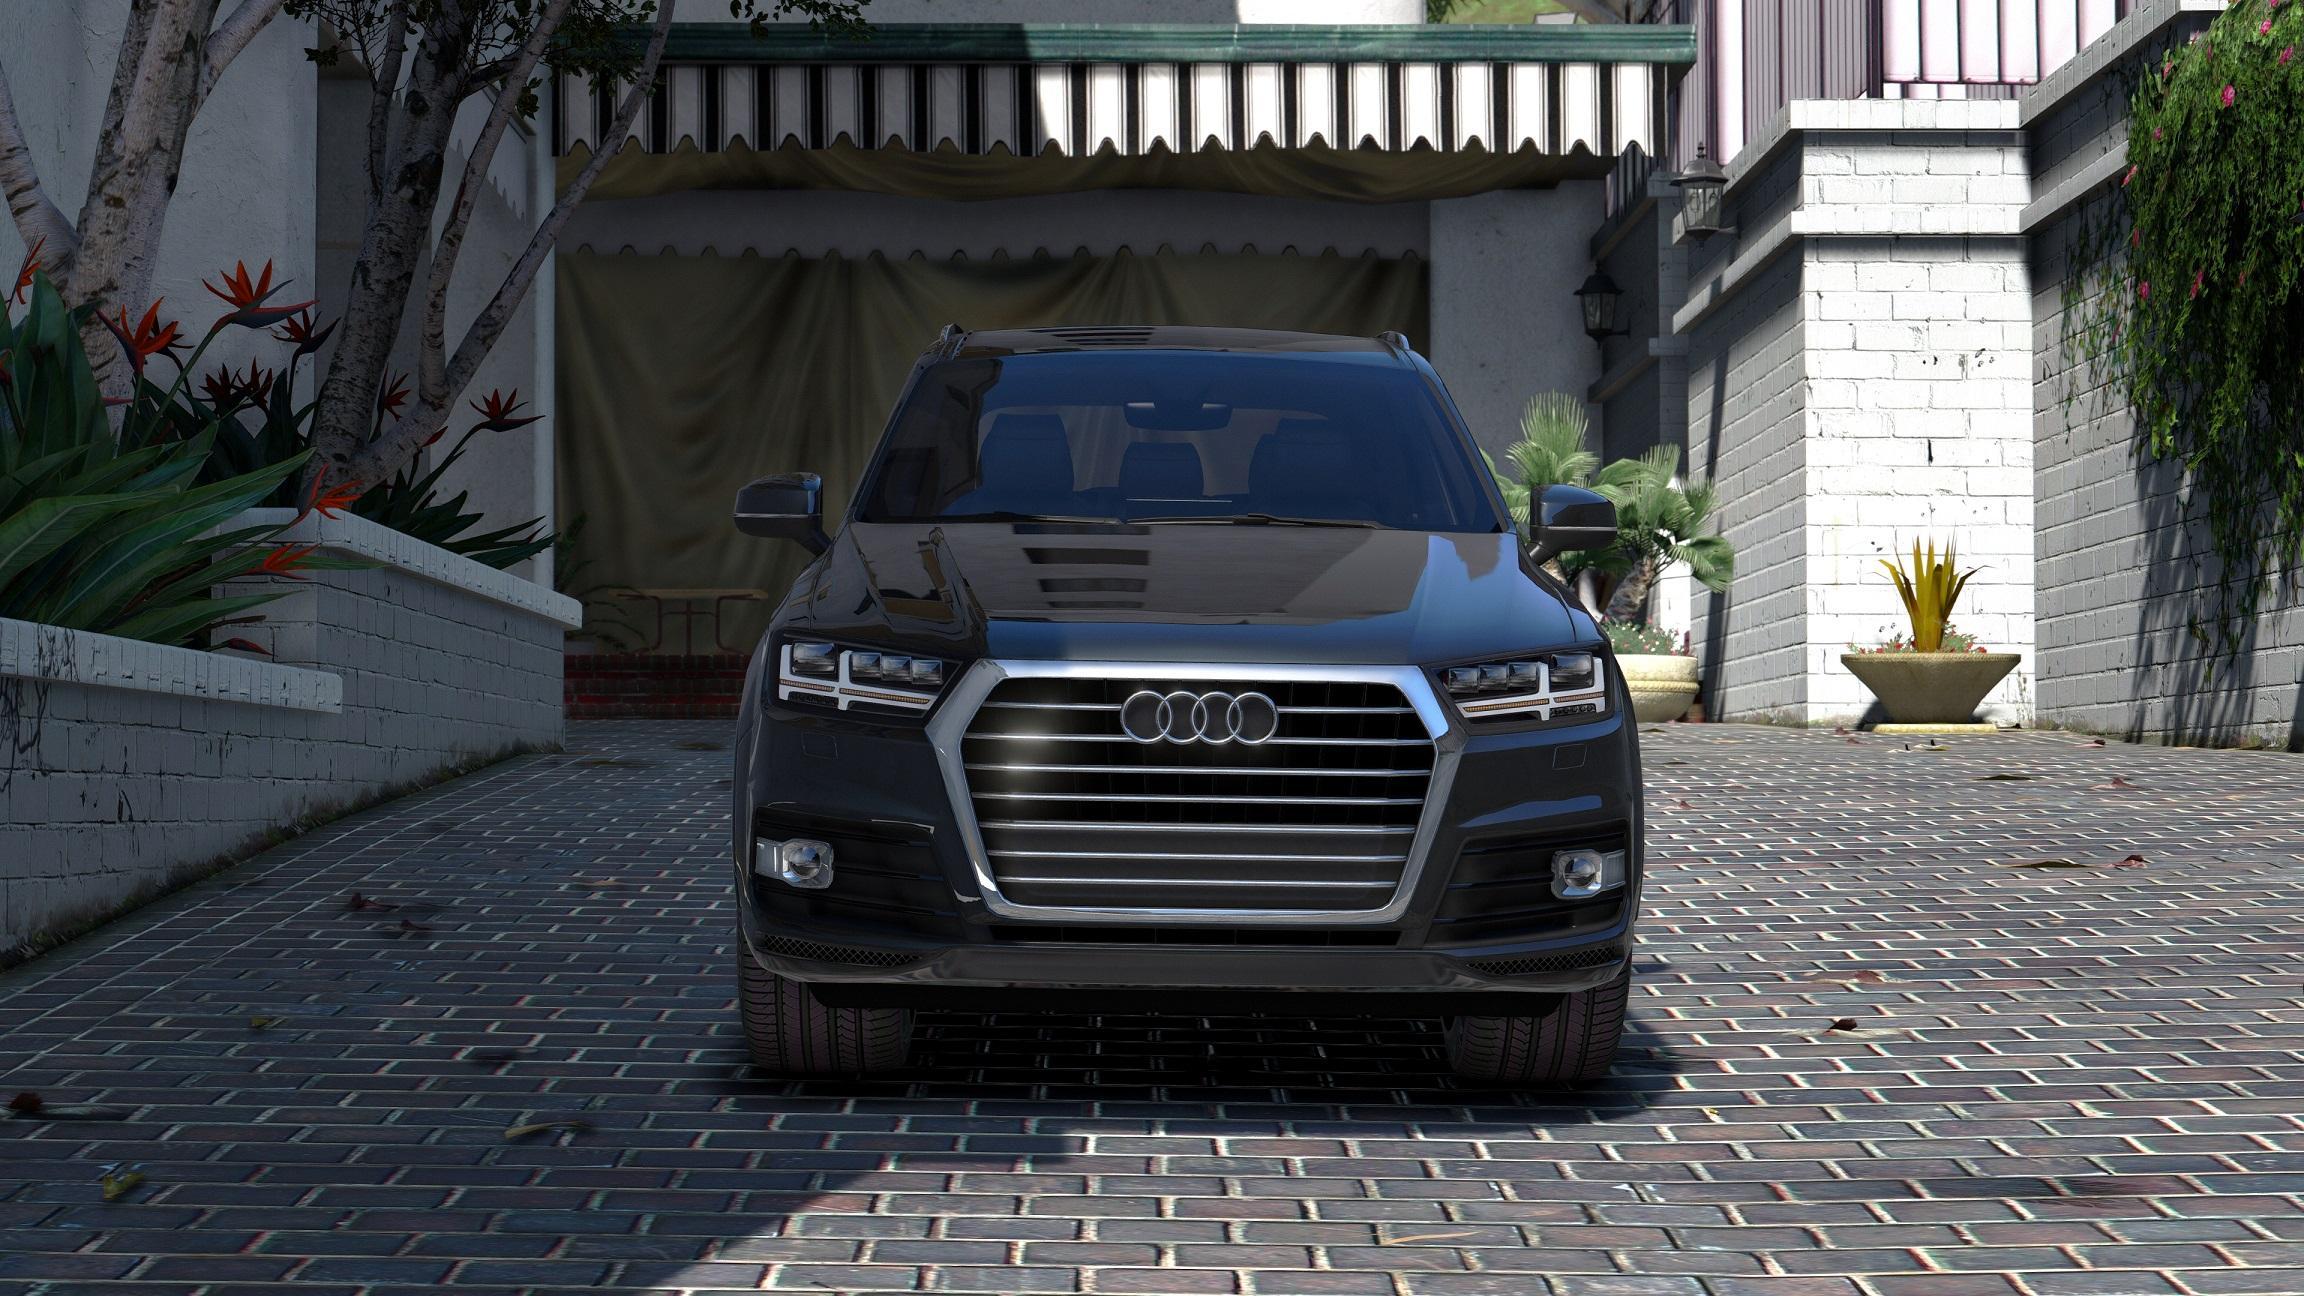 2016 Audi Q7 Gta5 Mods Com